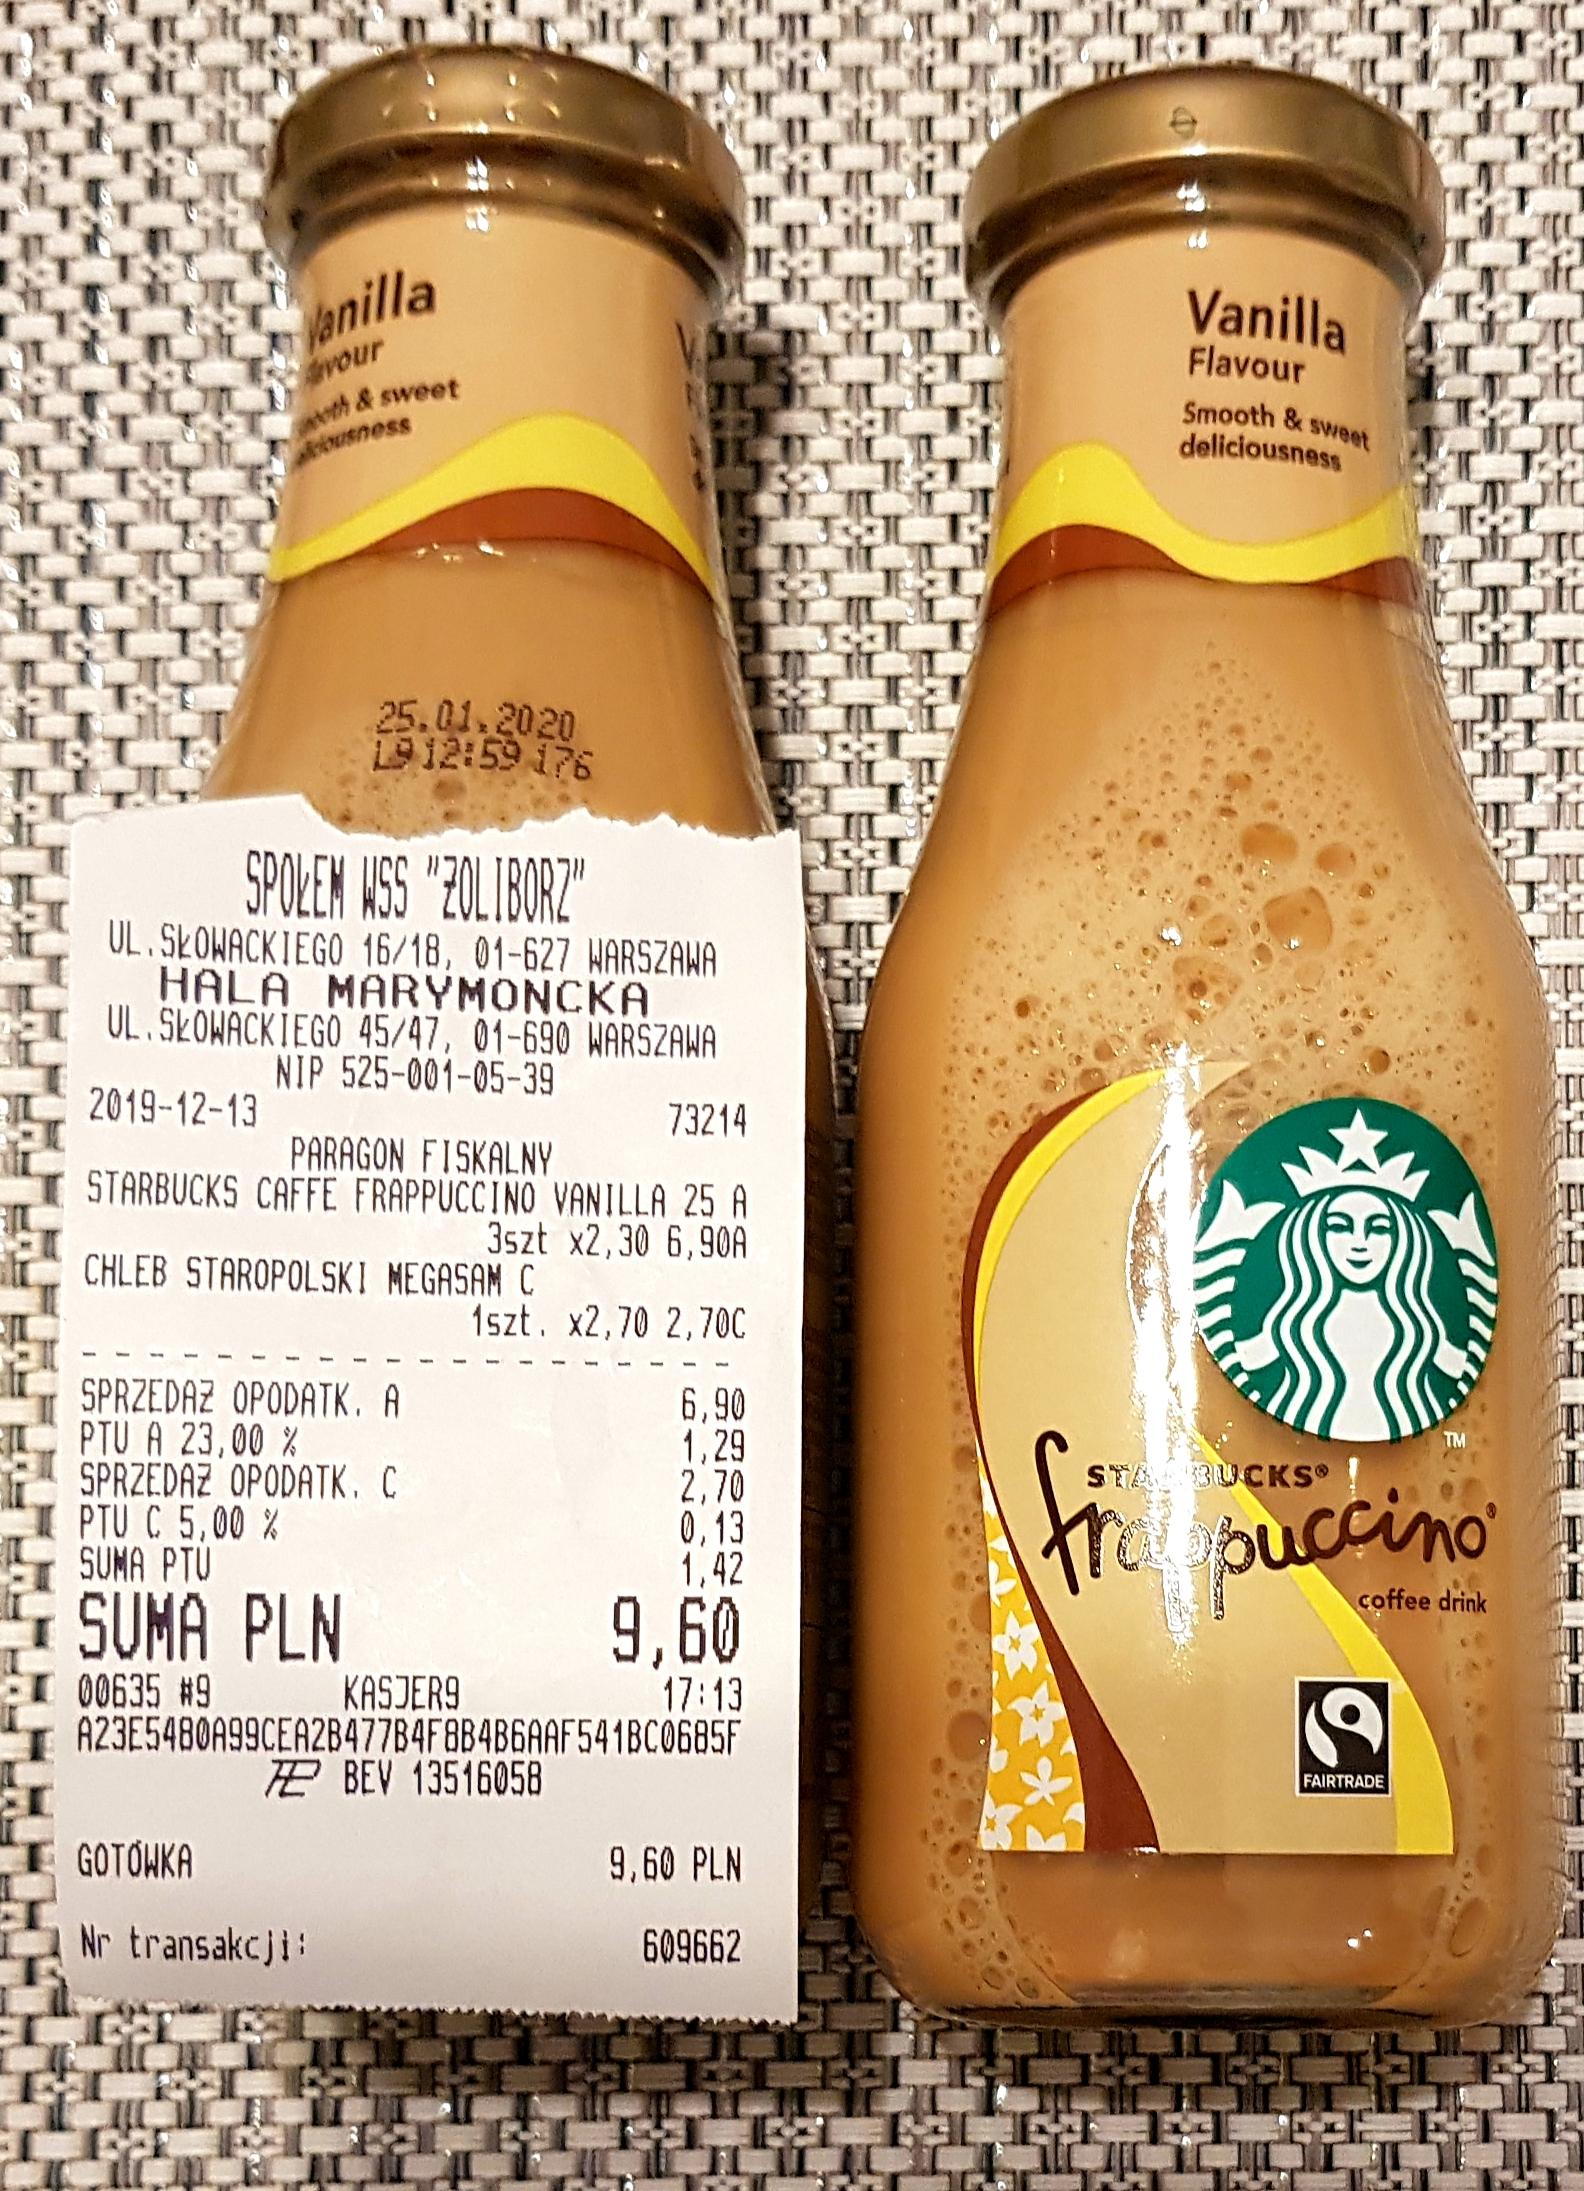 Starbucks frappuccino termin ważności 25.01.20